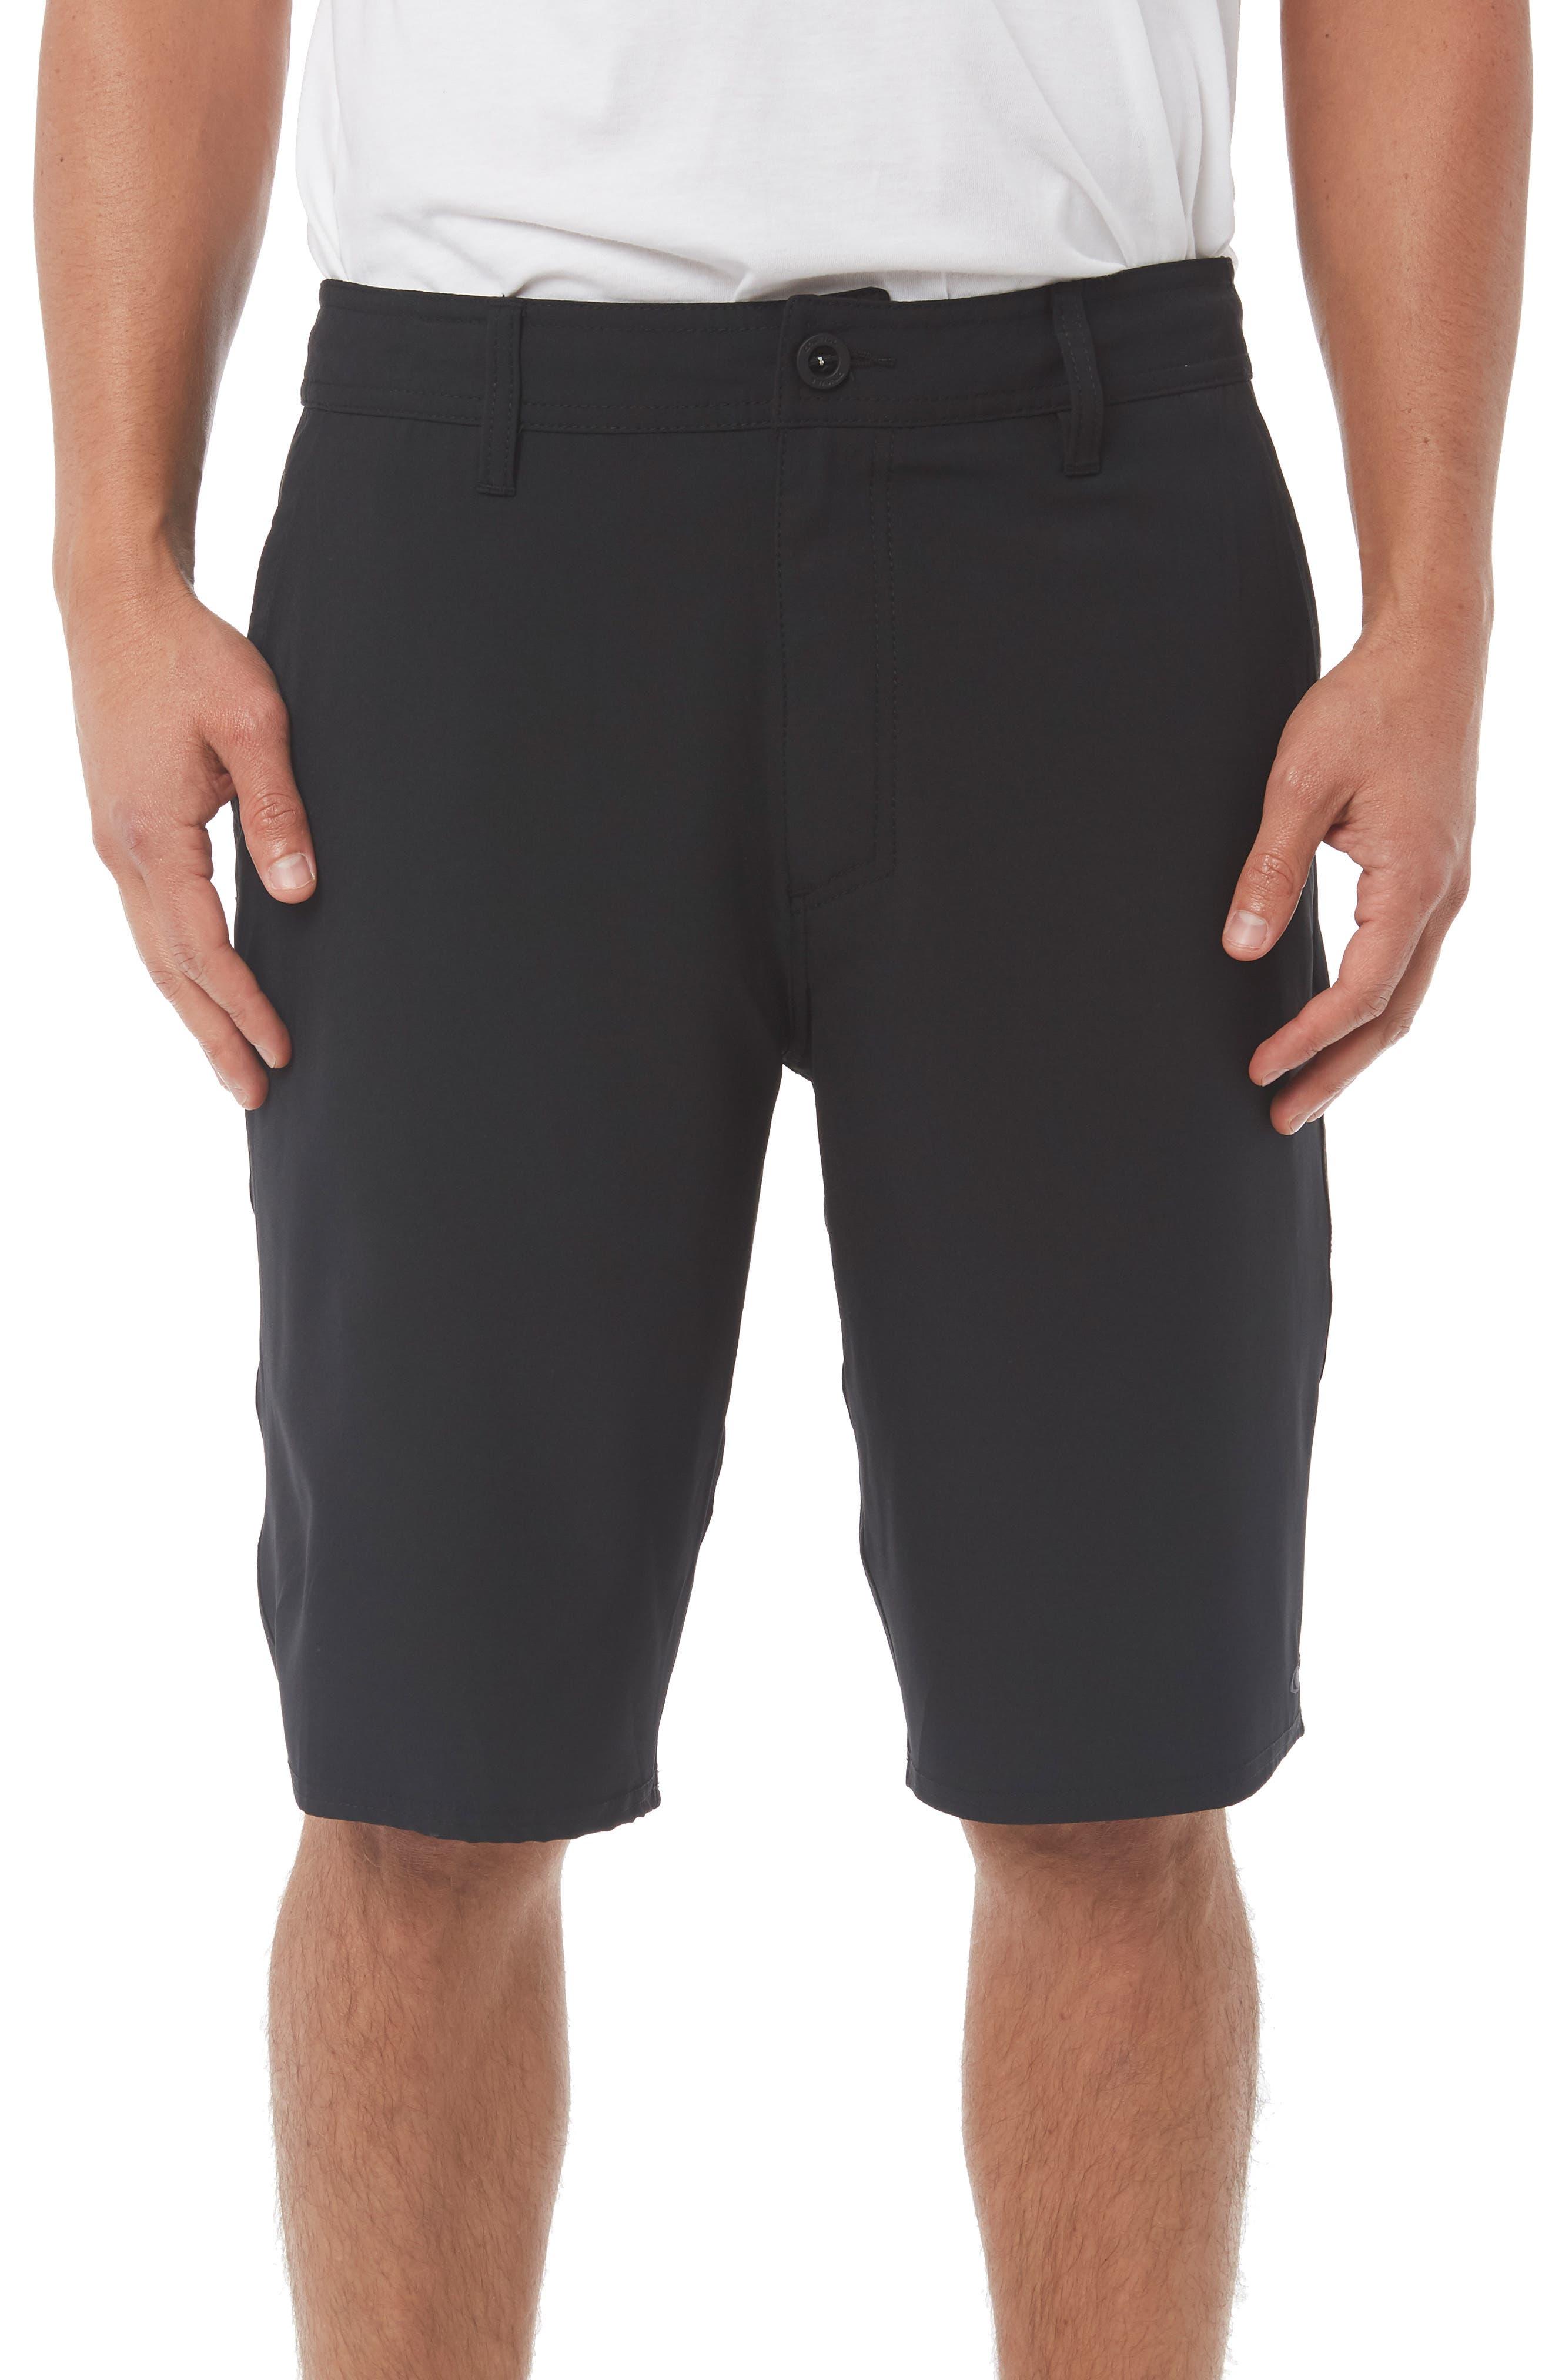 Loaded Hybrid Shorts,                             Main thumbnail 1, color,                             BLACK